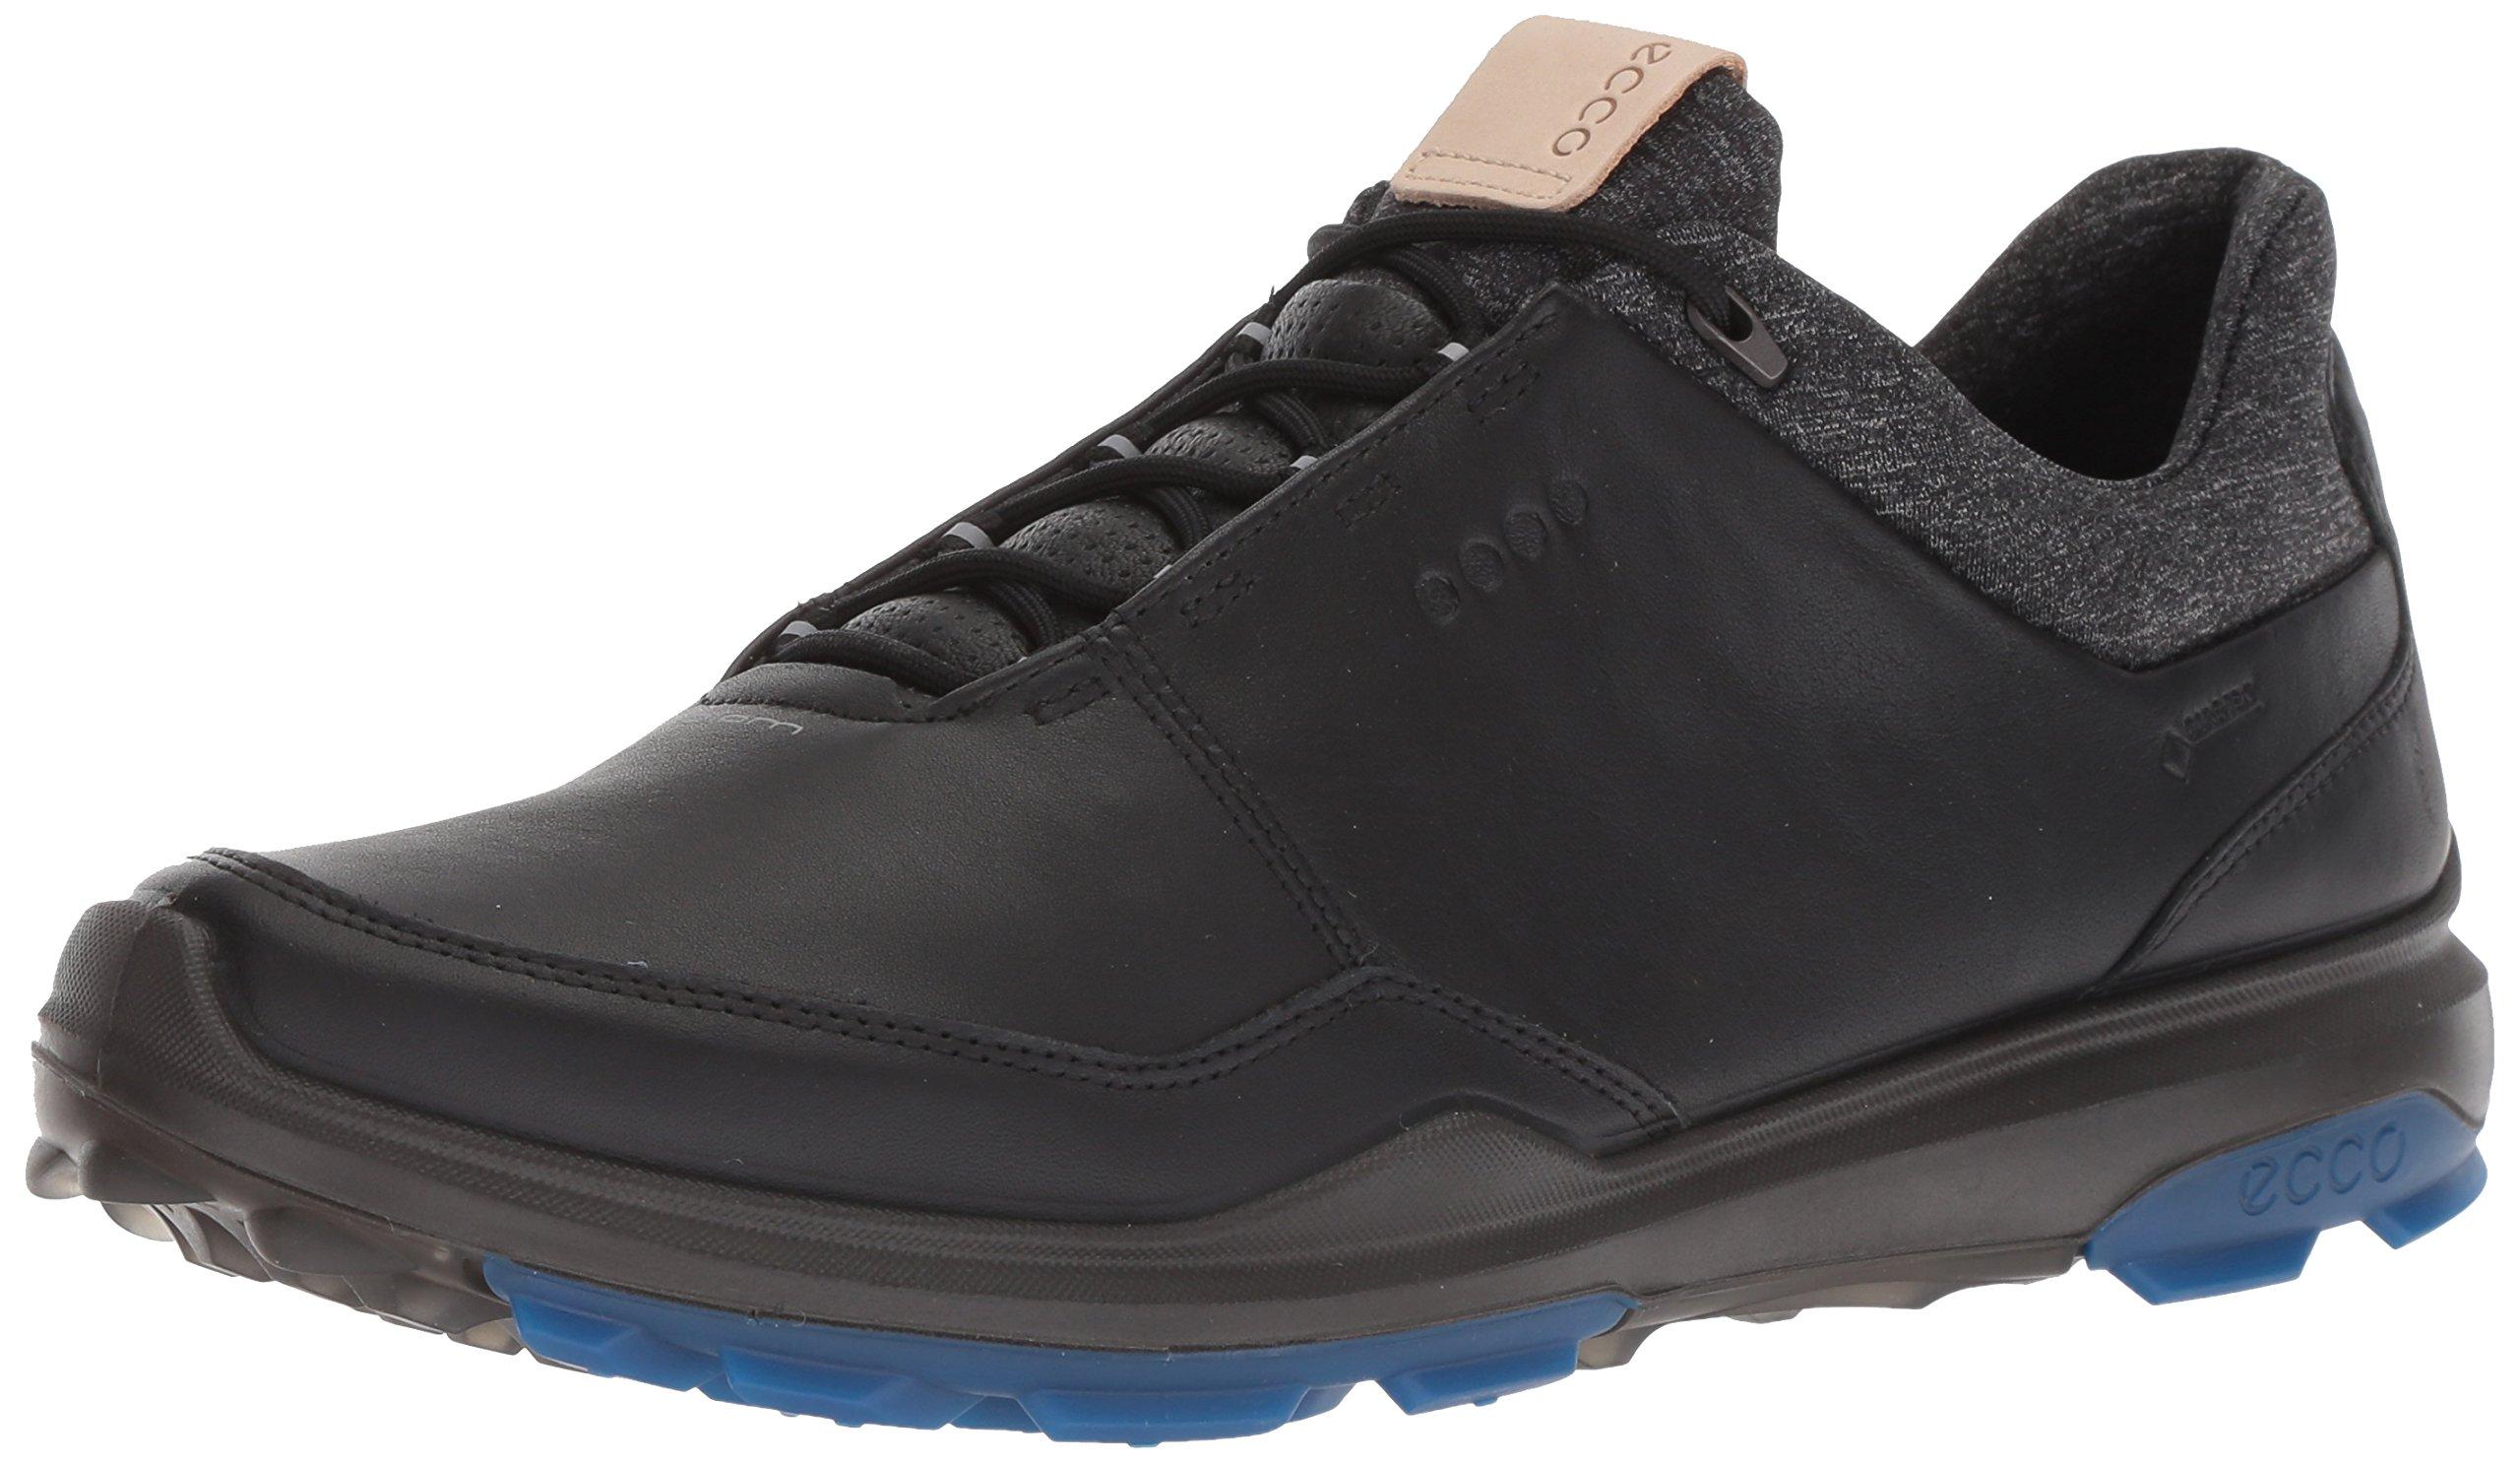 ECCO Men's Biom Hybrid 3 Gore-Tex Golf Shoe, Black/Bermuda Blue Yak Leather, 8 M US by ECCO